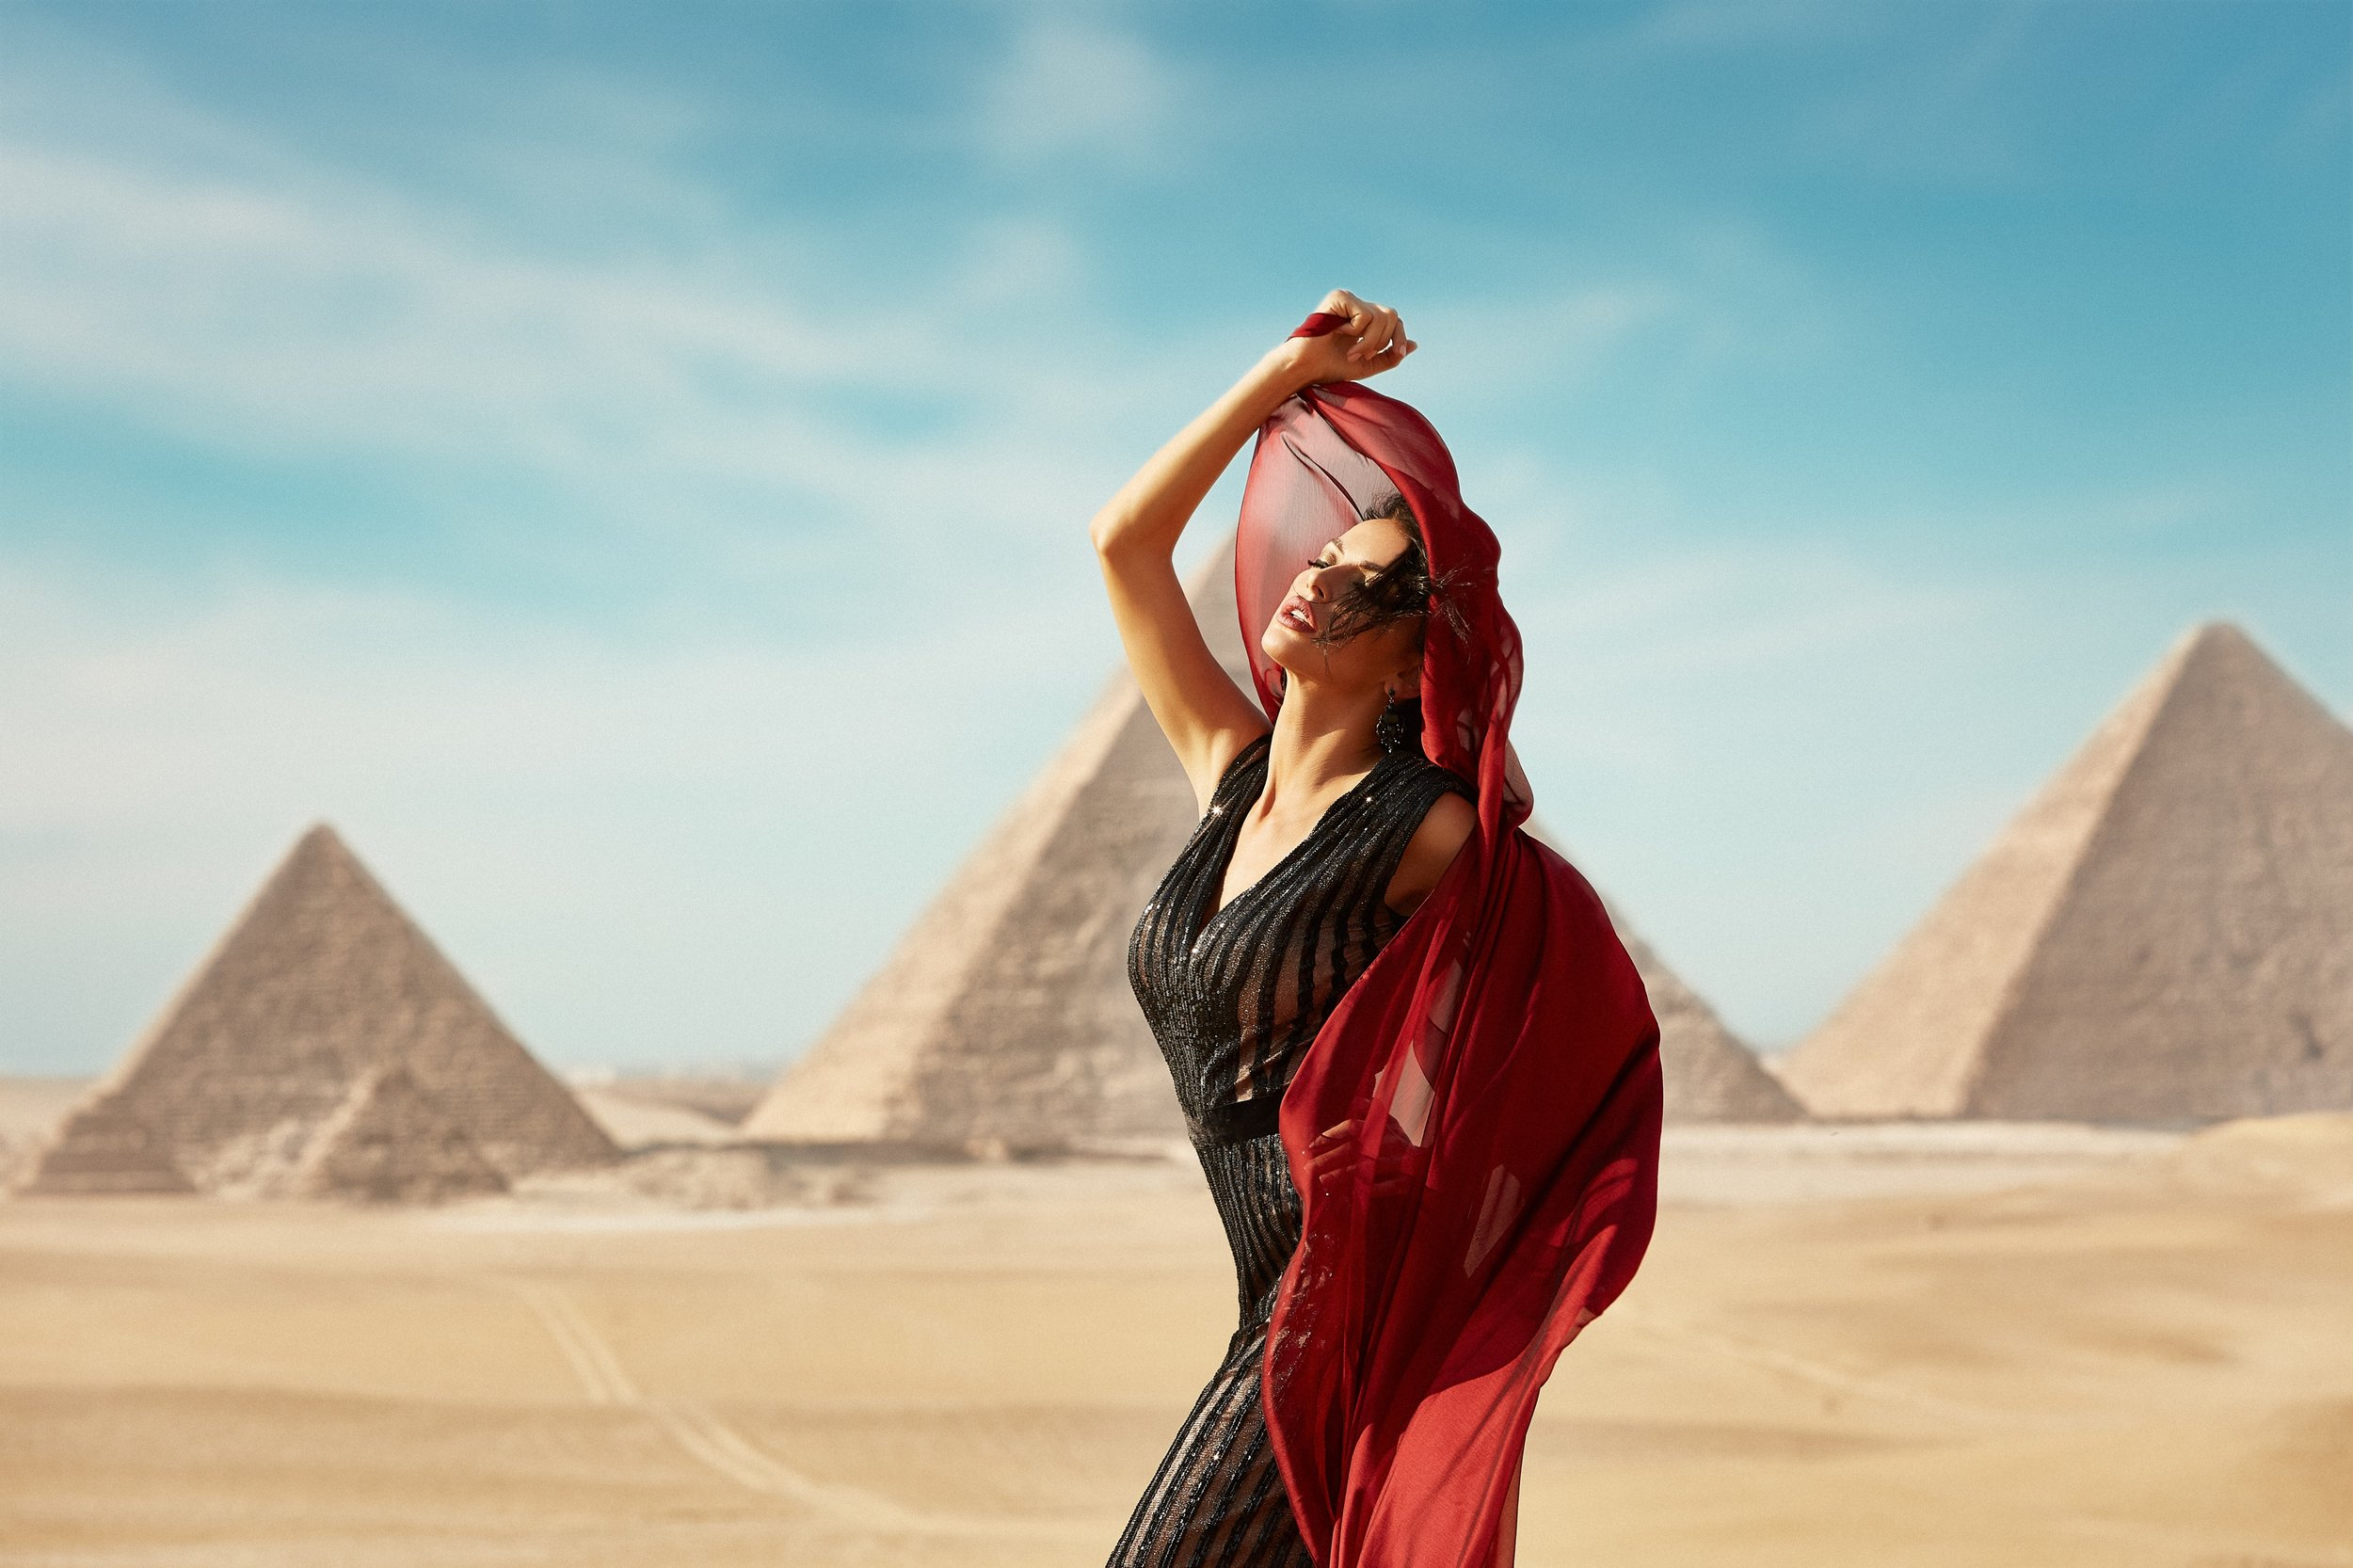 Emma Vogue Arabia - Egypt 2.JPG